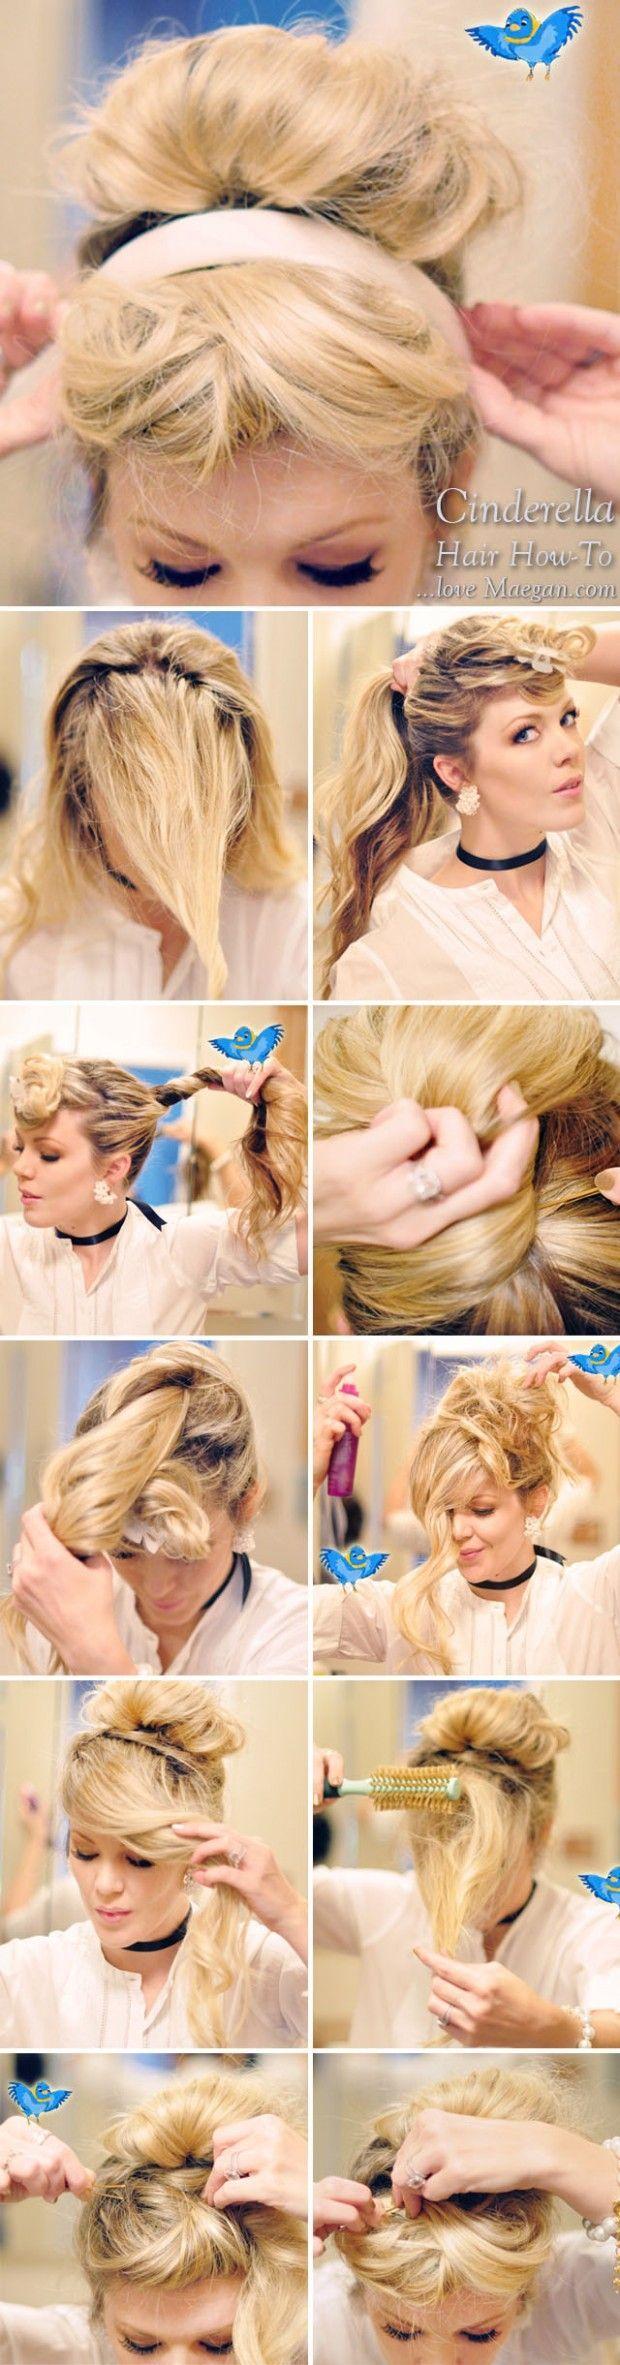 How-to Cinderella Hair & Makeup {Photo Tutorial}   ...love Maegan